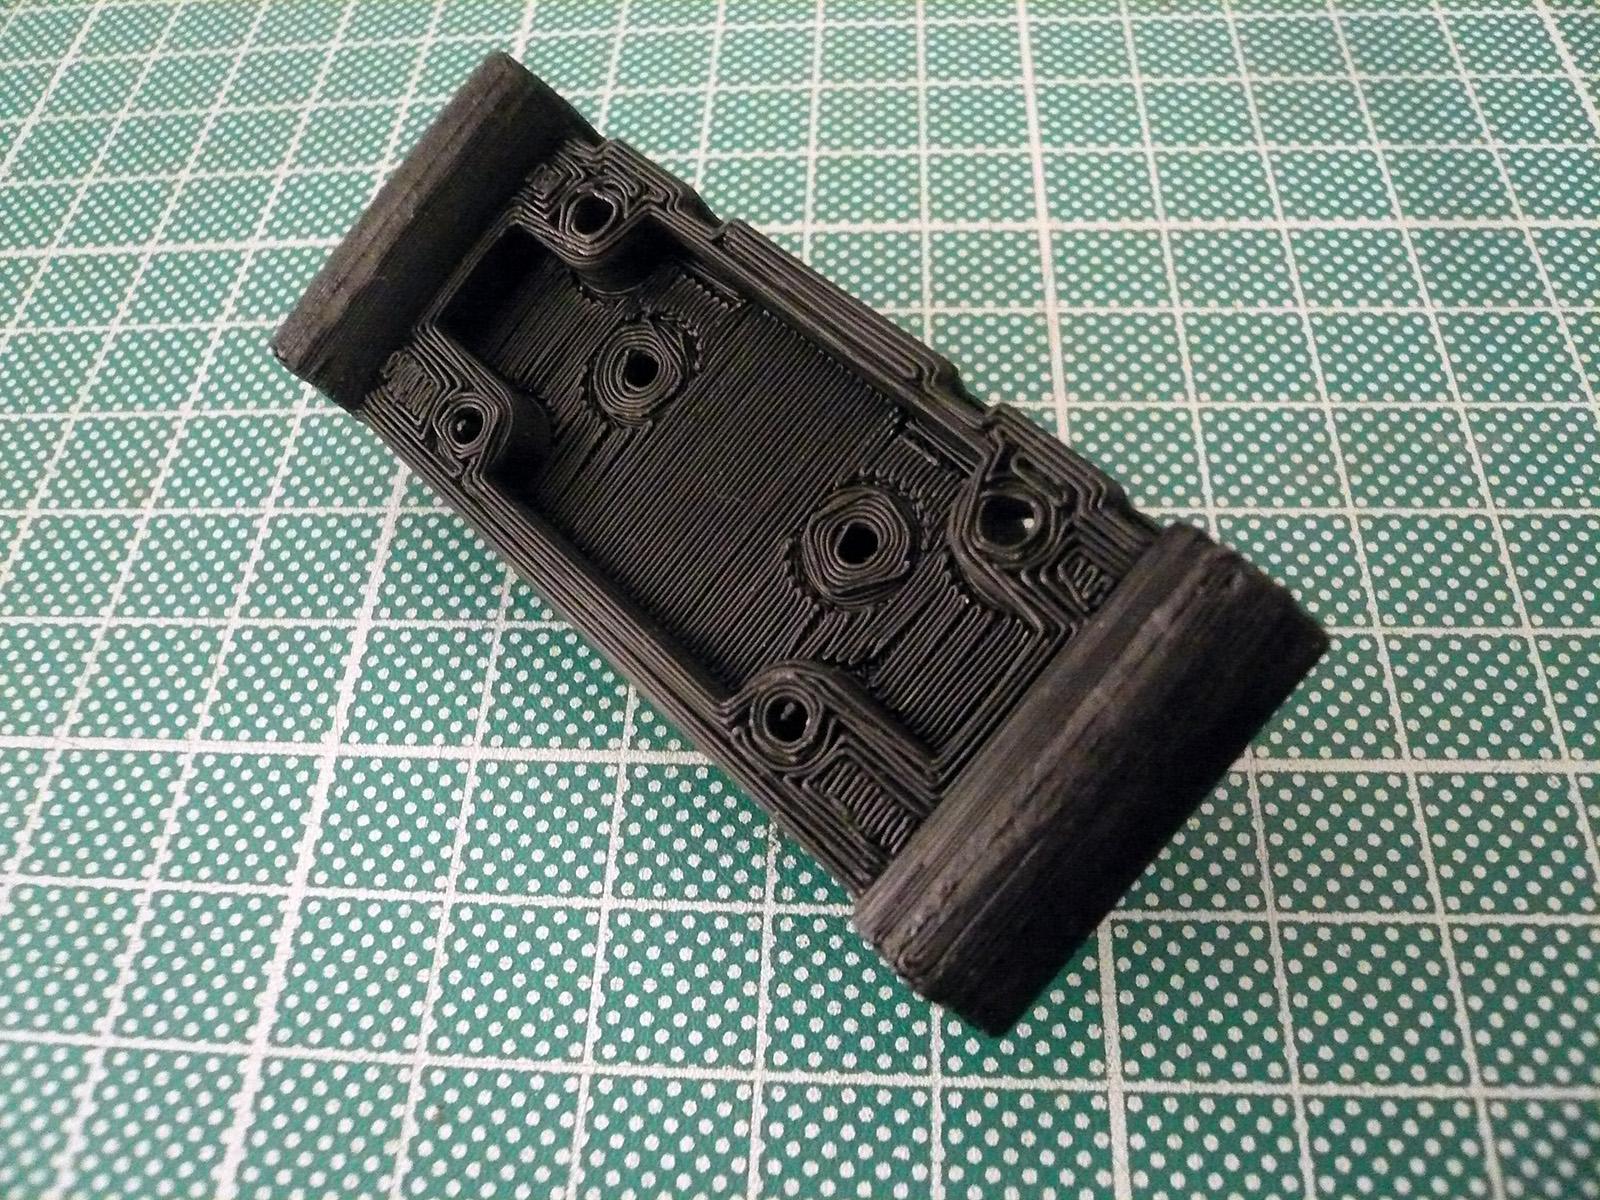 tamiya wrenchdog dyna storm dyna blaster tr-15t db211x prototype bulkhead d5 3d print